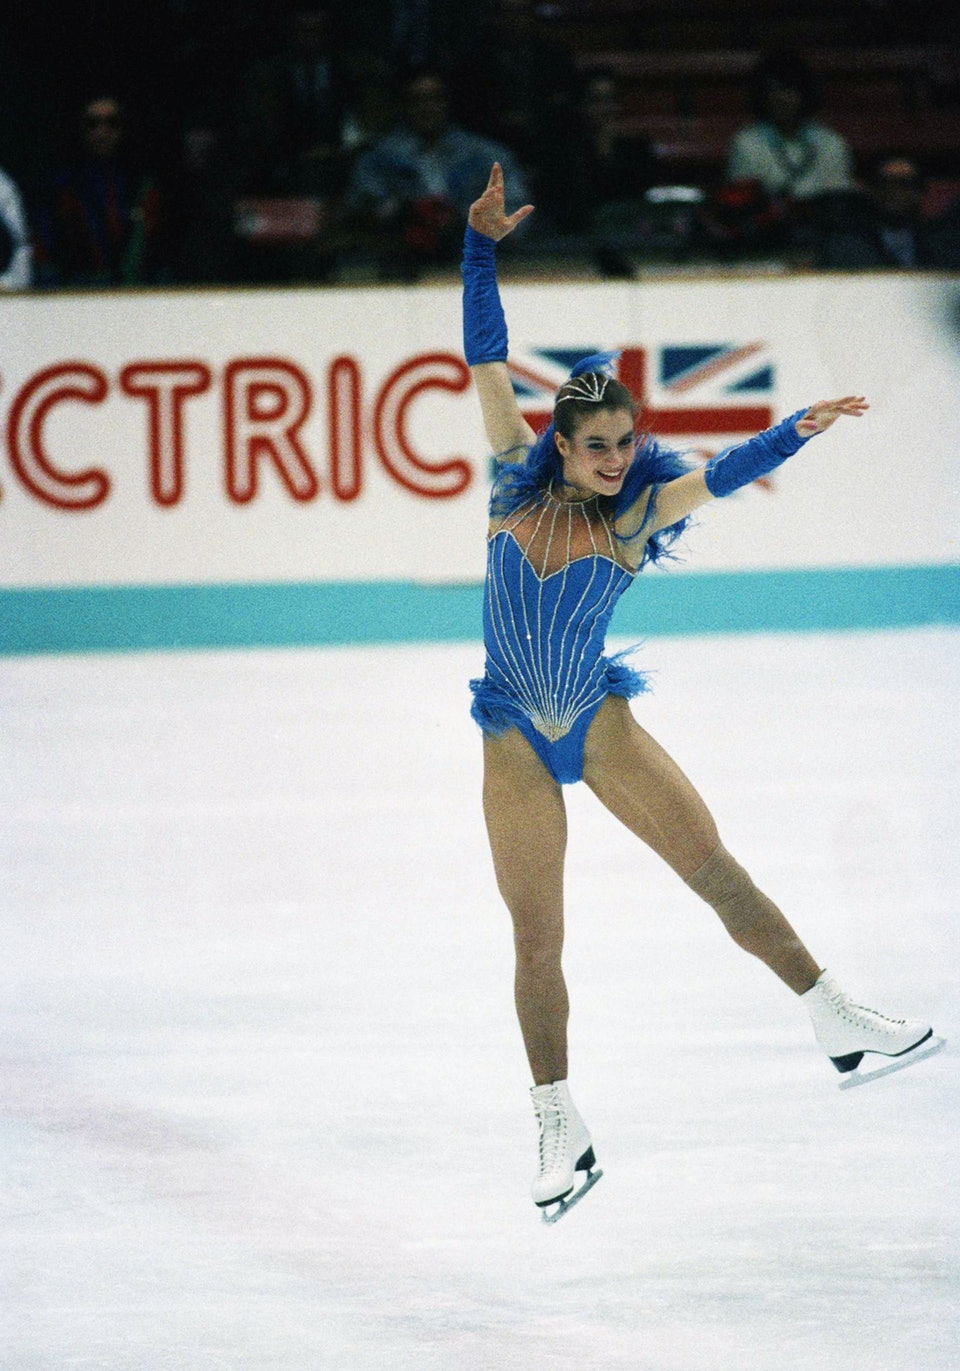 H Καταρίνα Βιτ με το «σκανδαλώδες» μπλε κοστούμι της στους Ολυμπιακούς του Κάλγκαρι το 1988, που οδήγησε την Παγκόσμια Ομοσπονδία Παγοδρομιών στη λήψη πιο αυστηρών ενδυματολογικών μέτρων ή αλλιώς στον κανονισμό «Katarina»